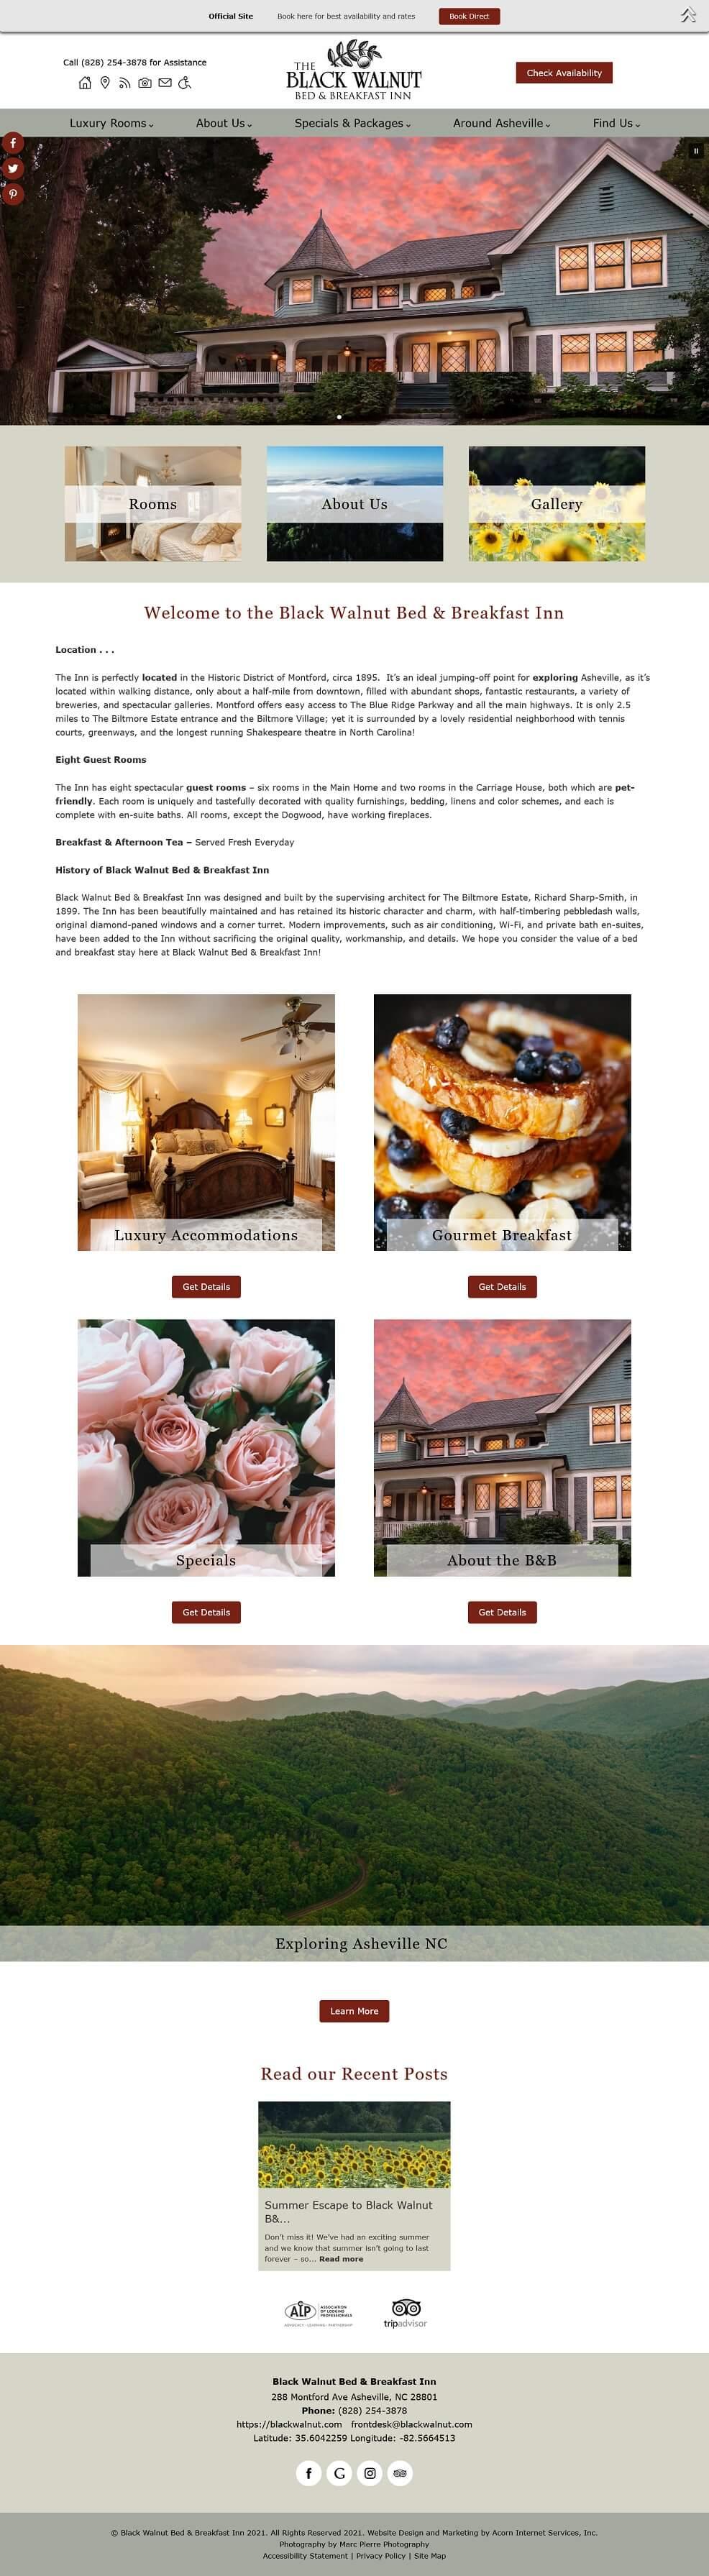 Black Walnut Bed & Breakfast home page